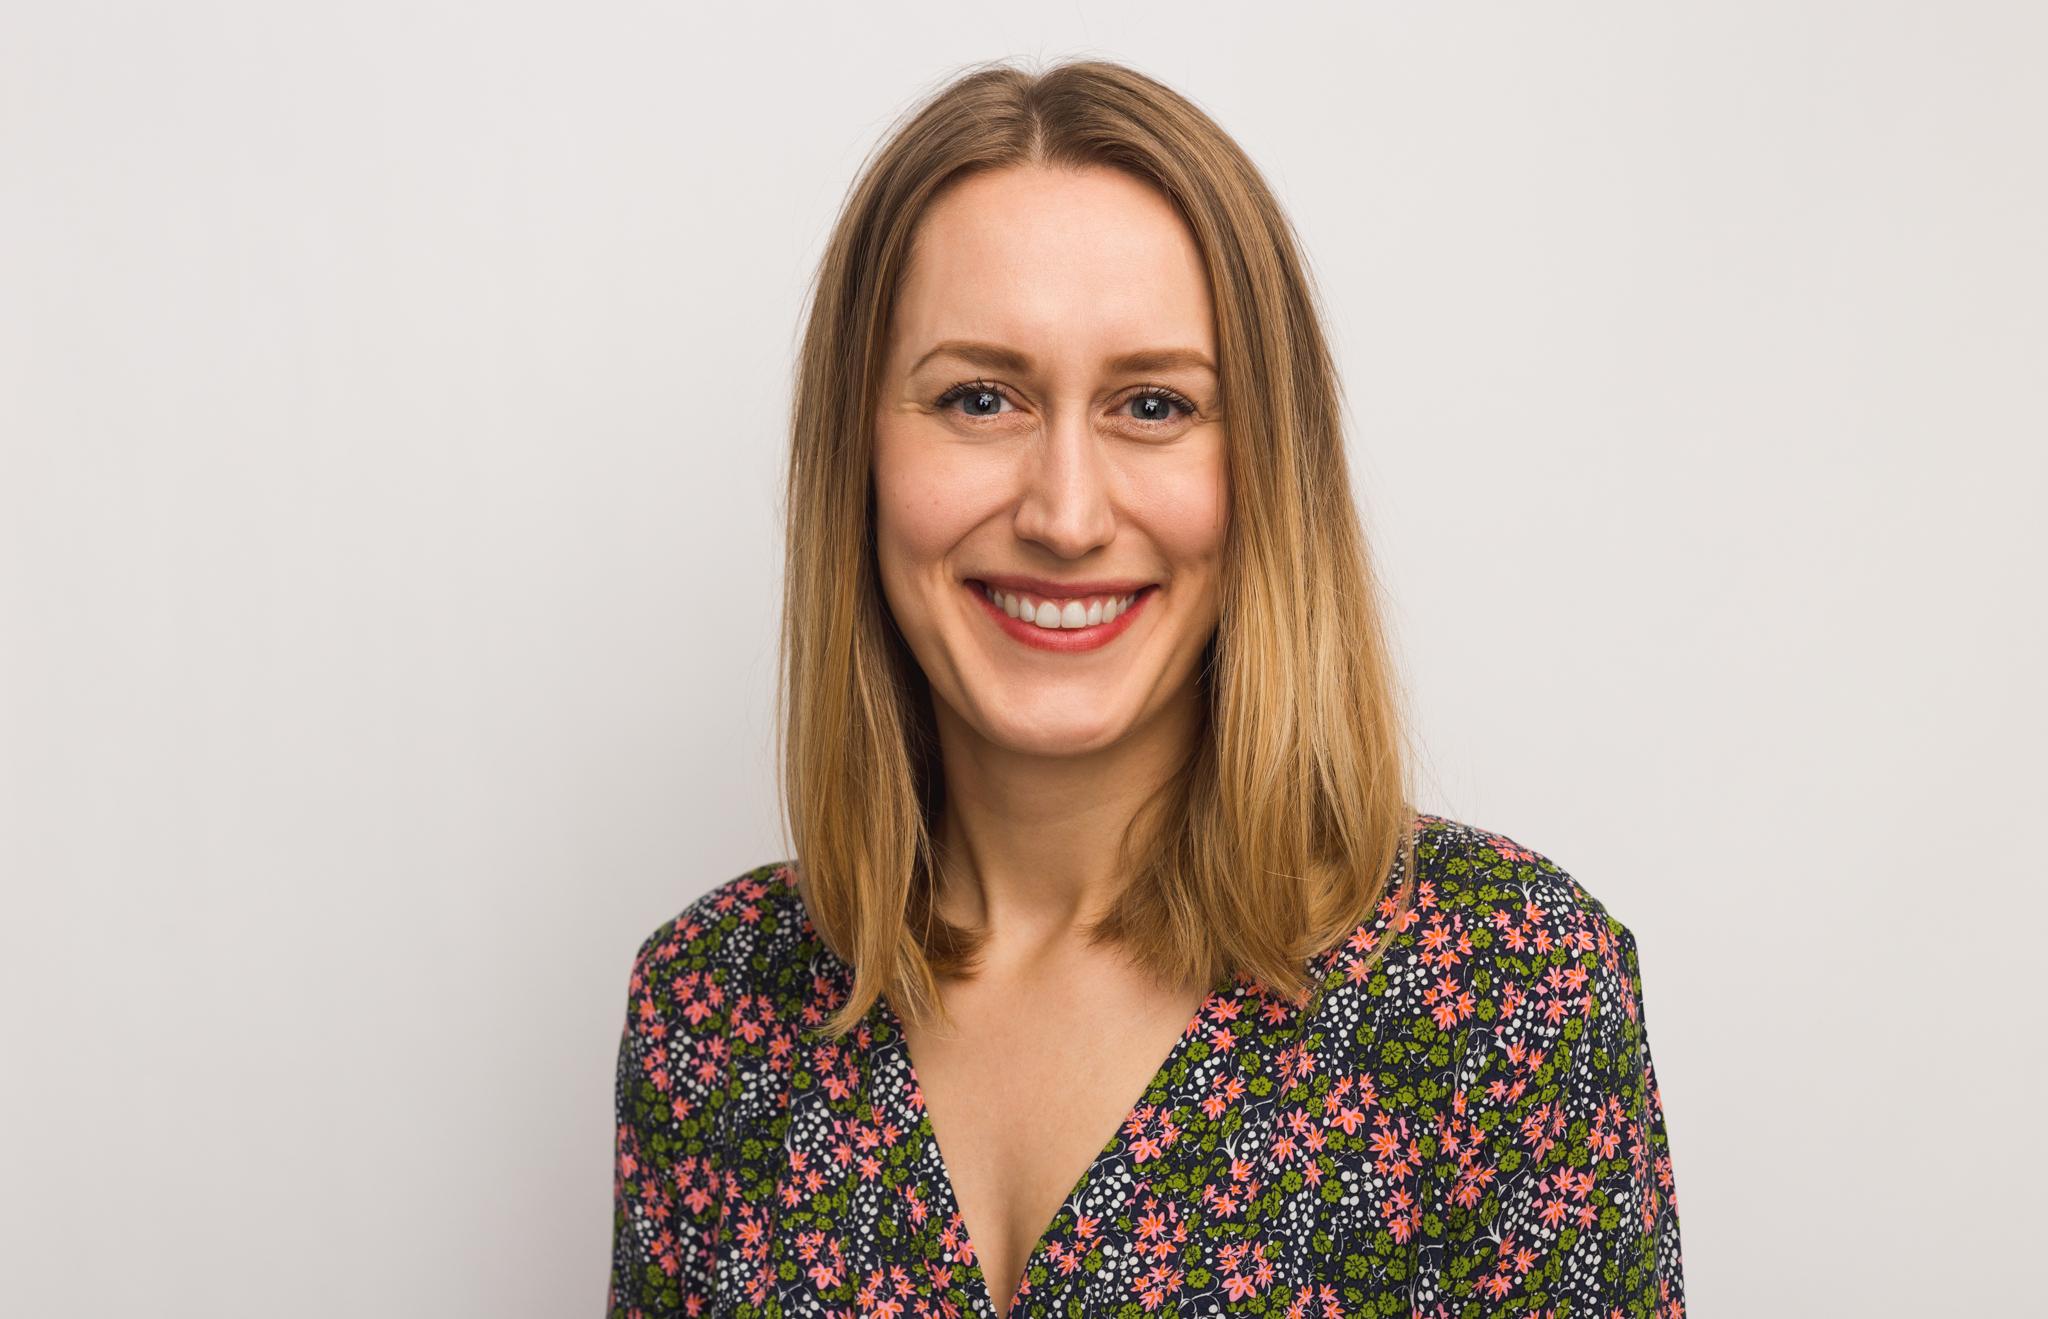 Lauren Holfeuer Floral Headshot 1.jpg